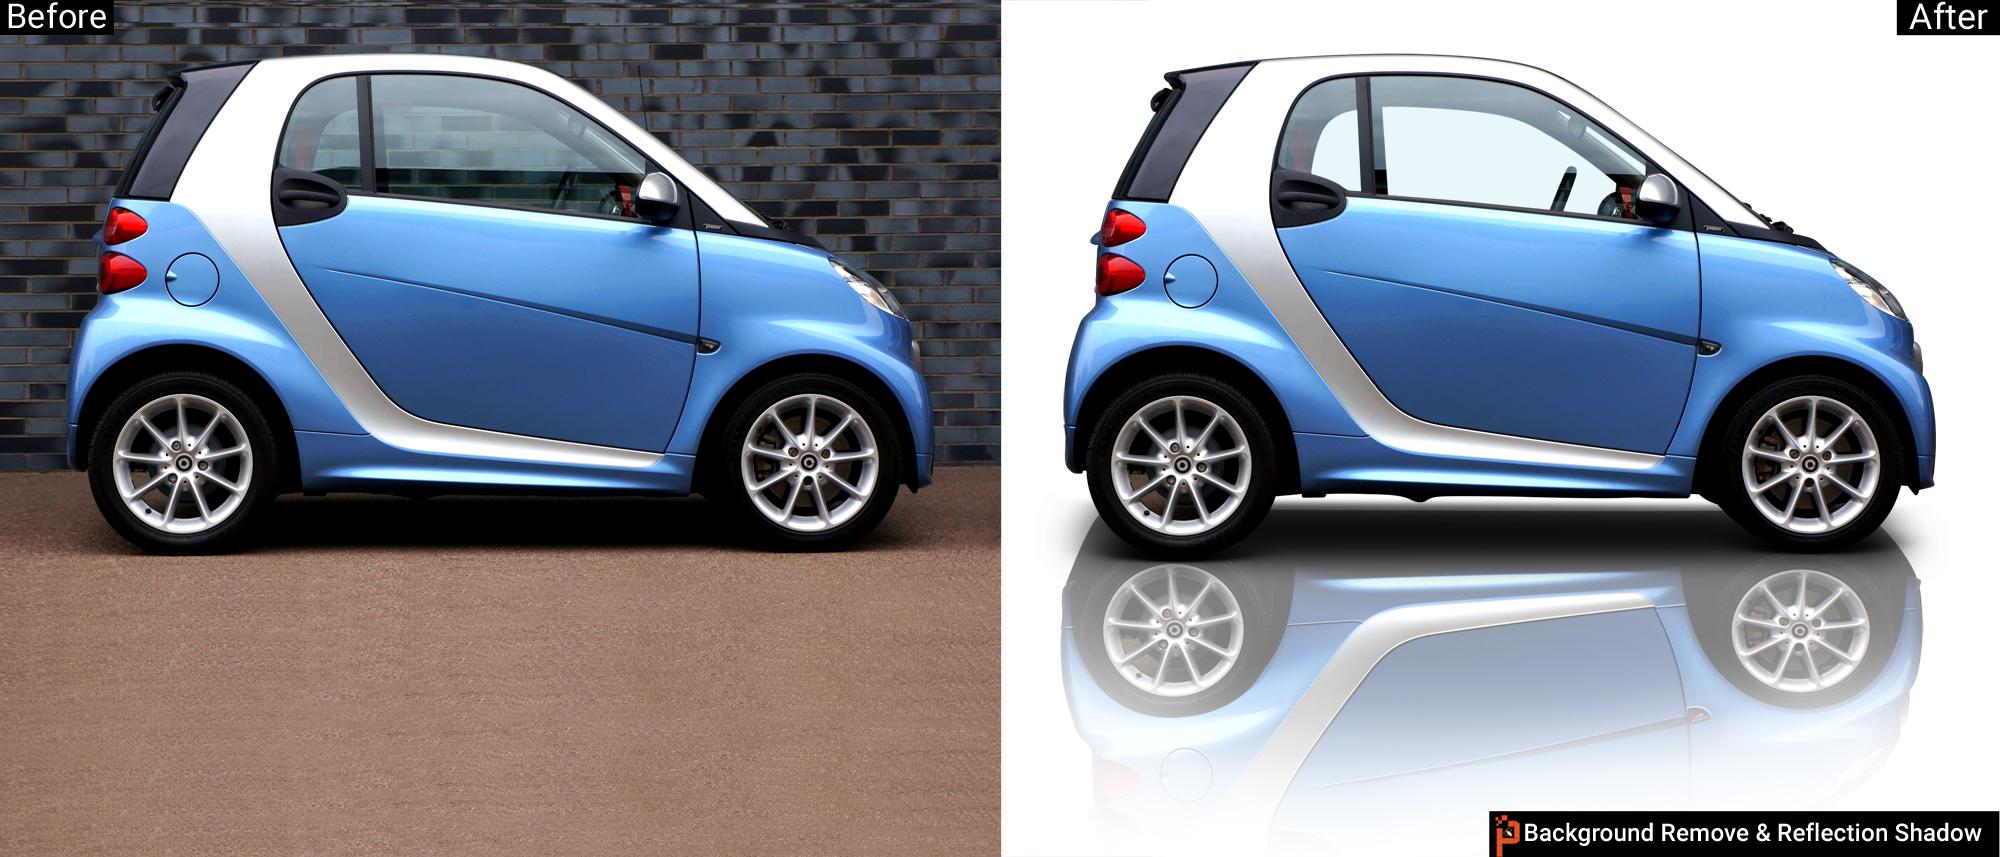 car-image-reflection-service.jpg